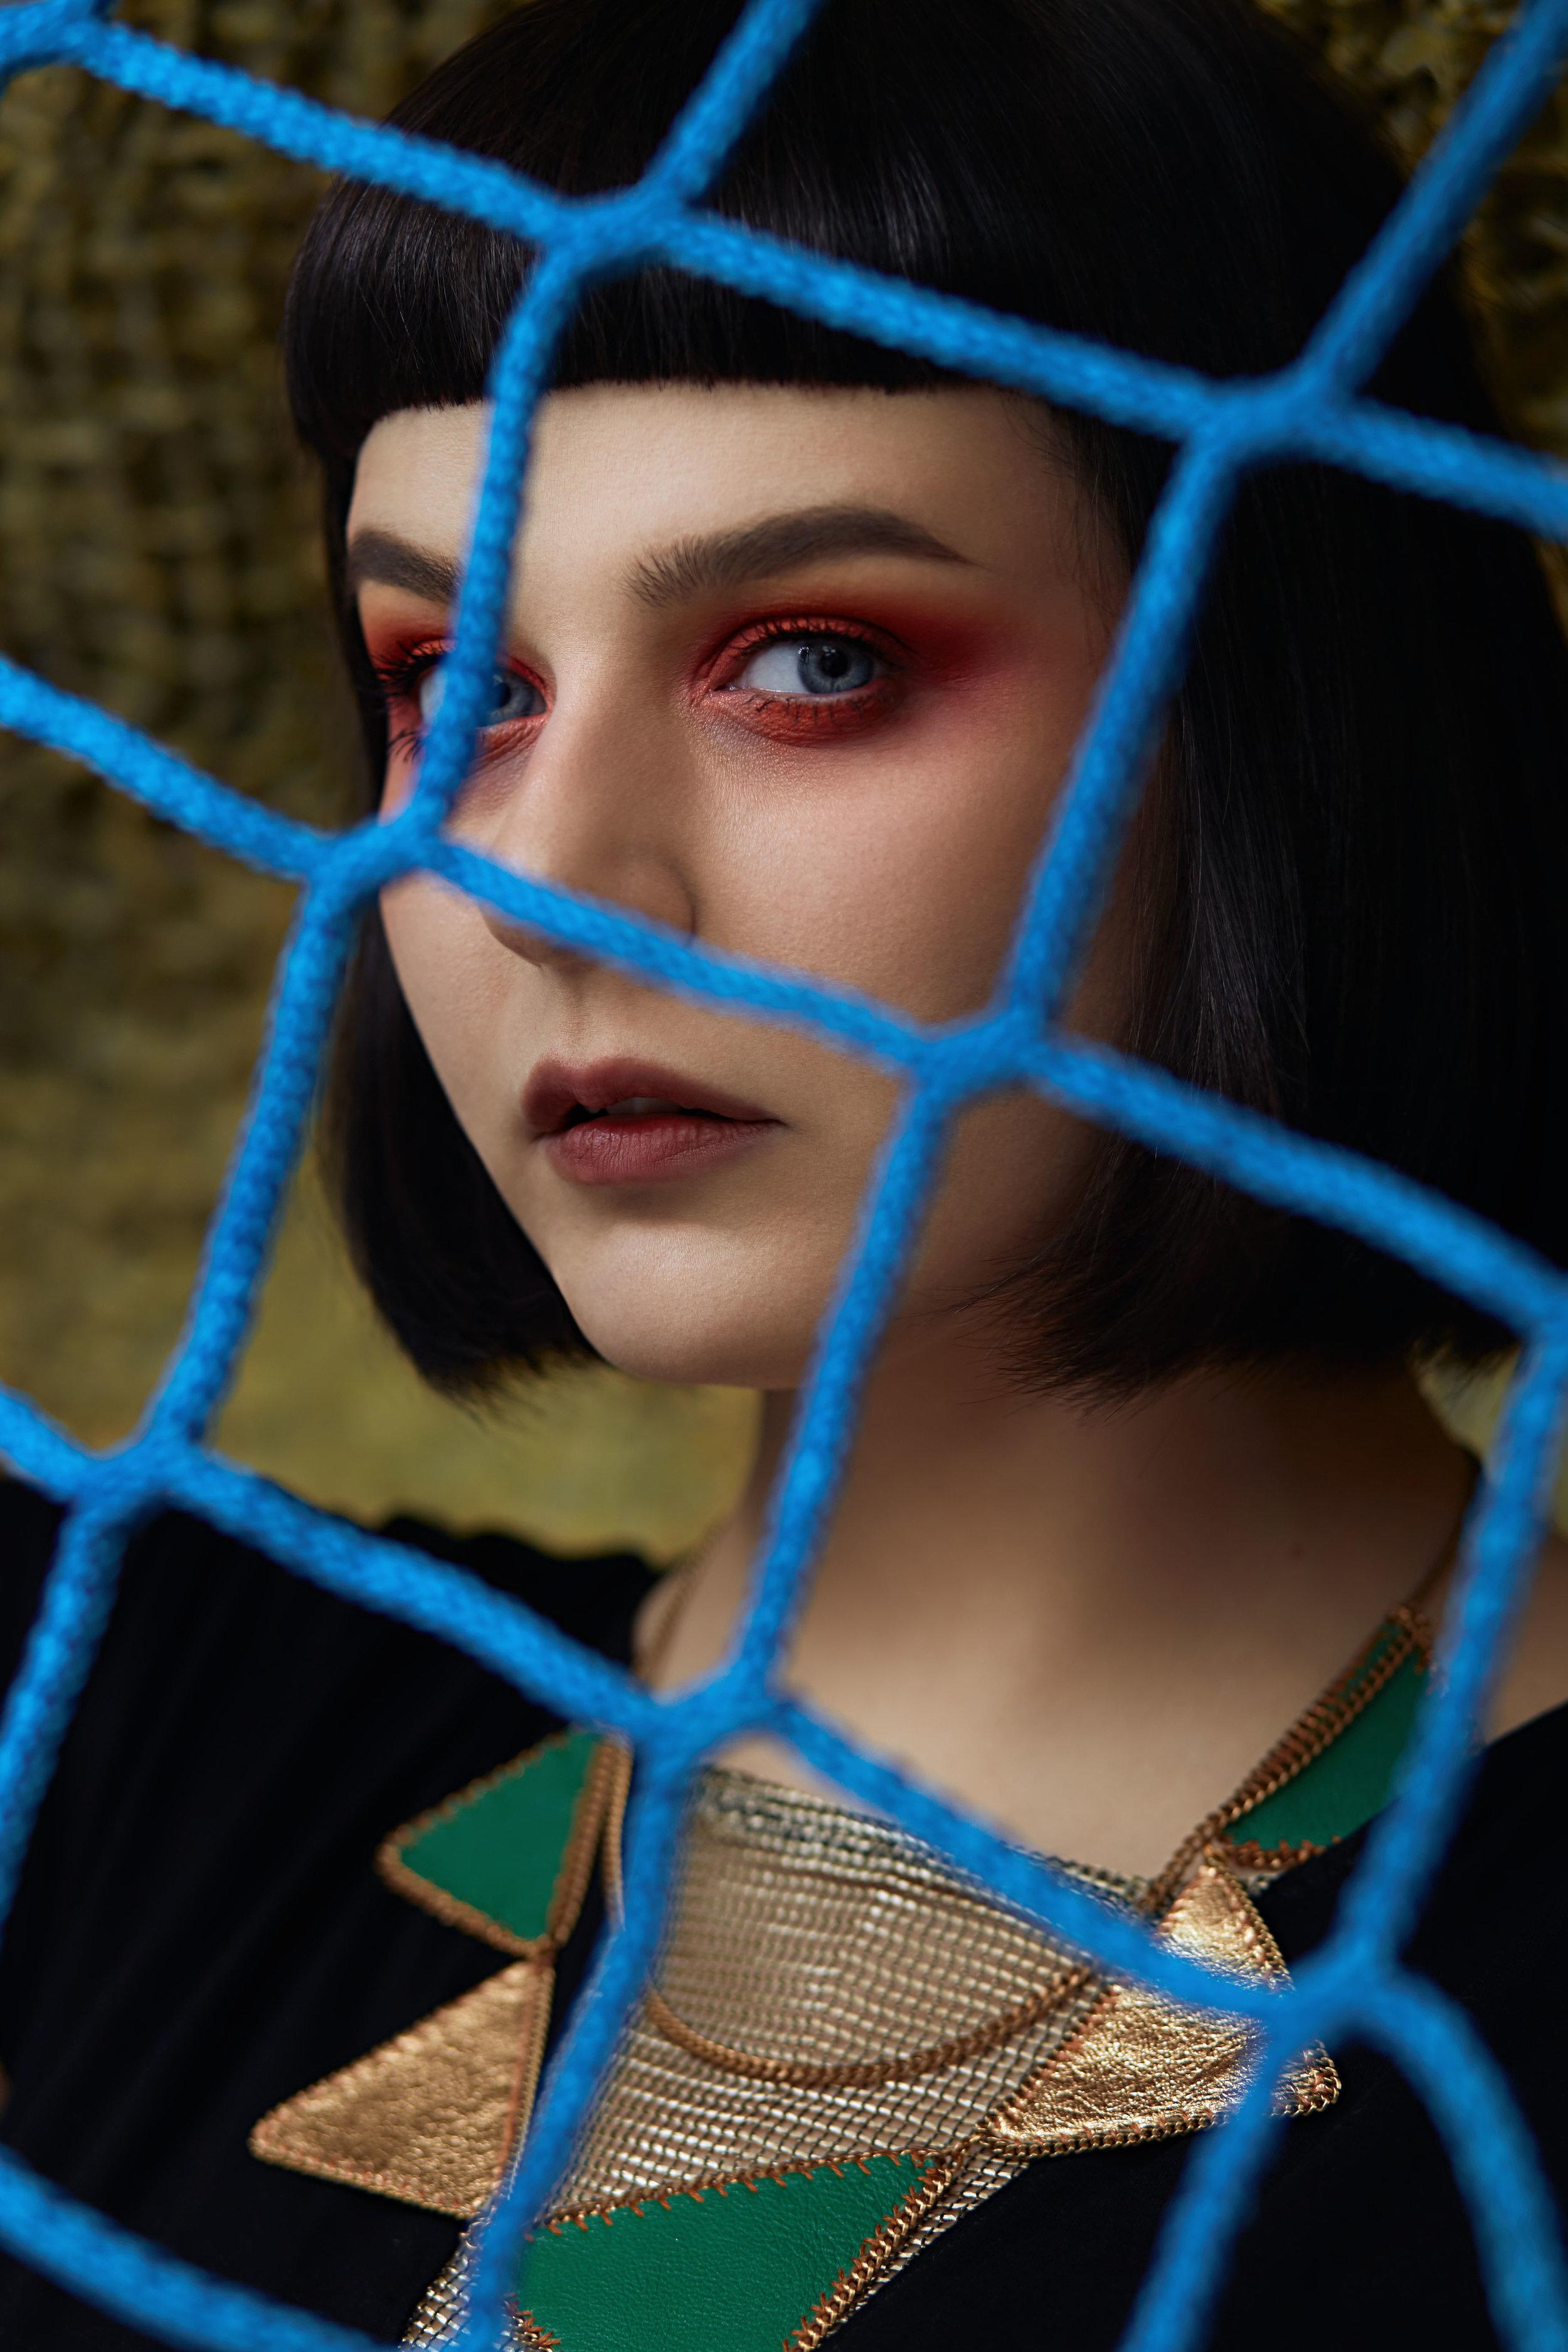 beauty photography makeup contrast colors.jpg